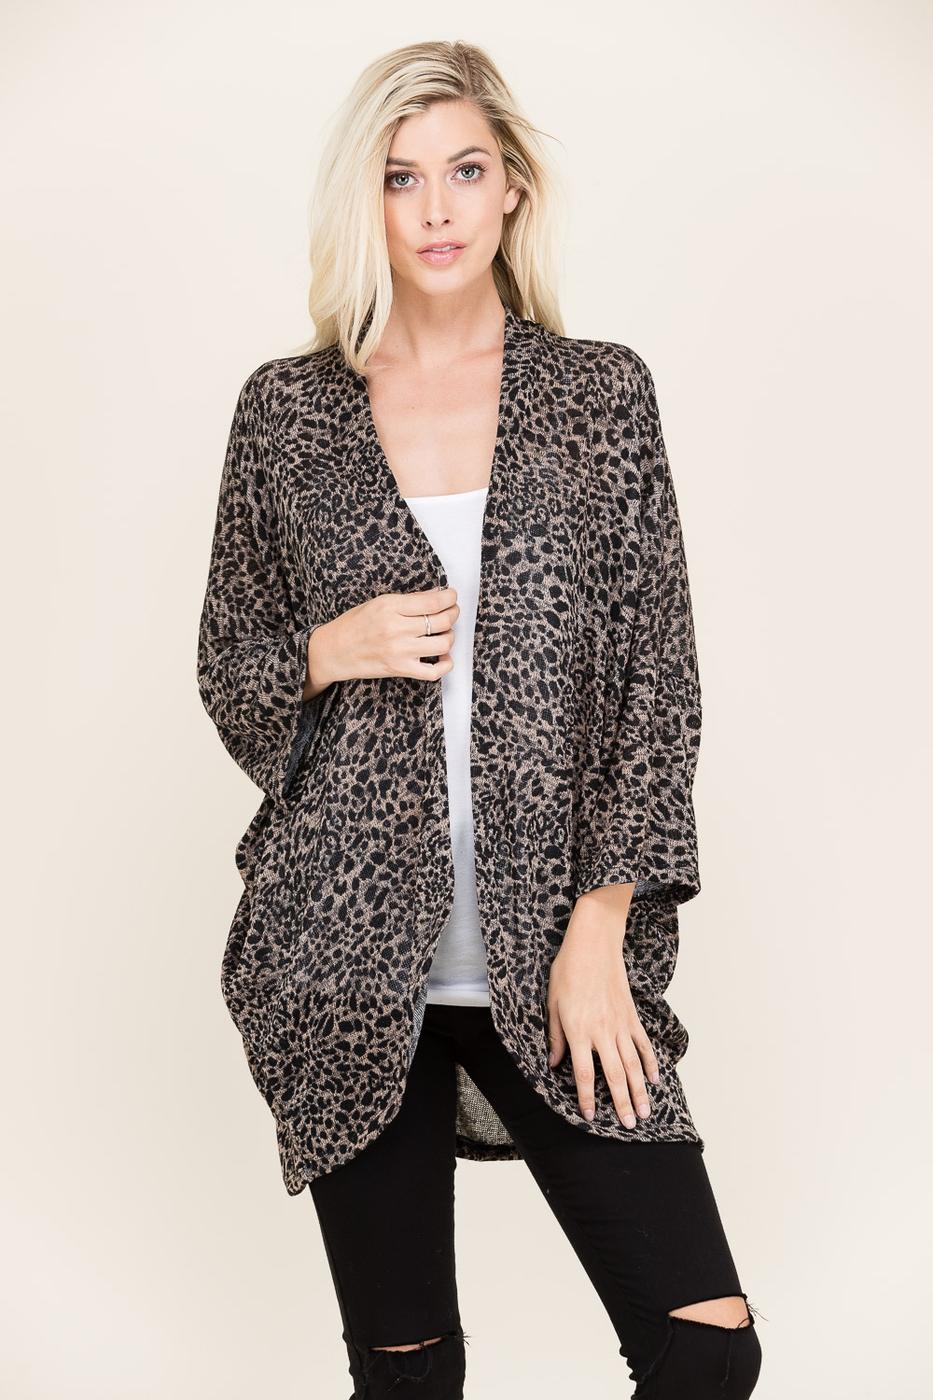 CREPAS Wholesale Leopard Print Kimono Cardigan | Orangeshine.com